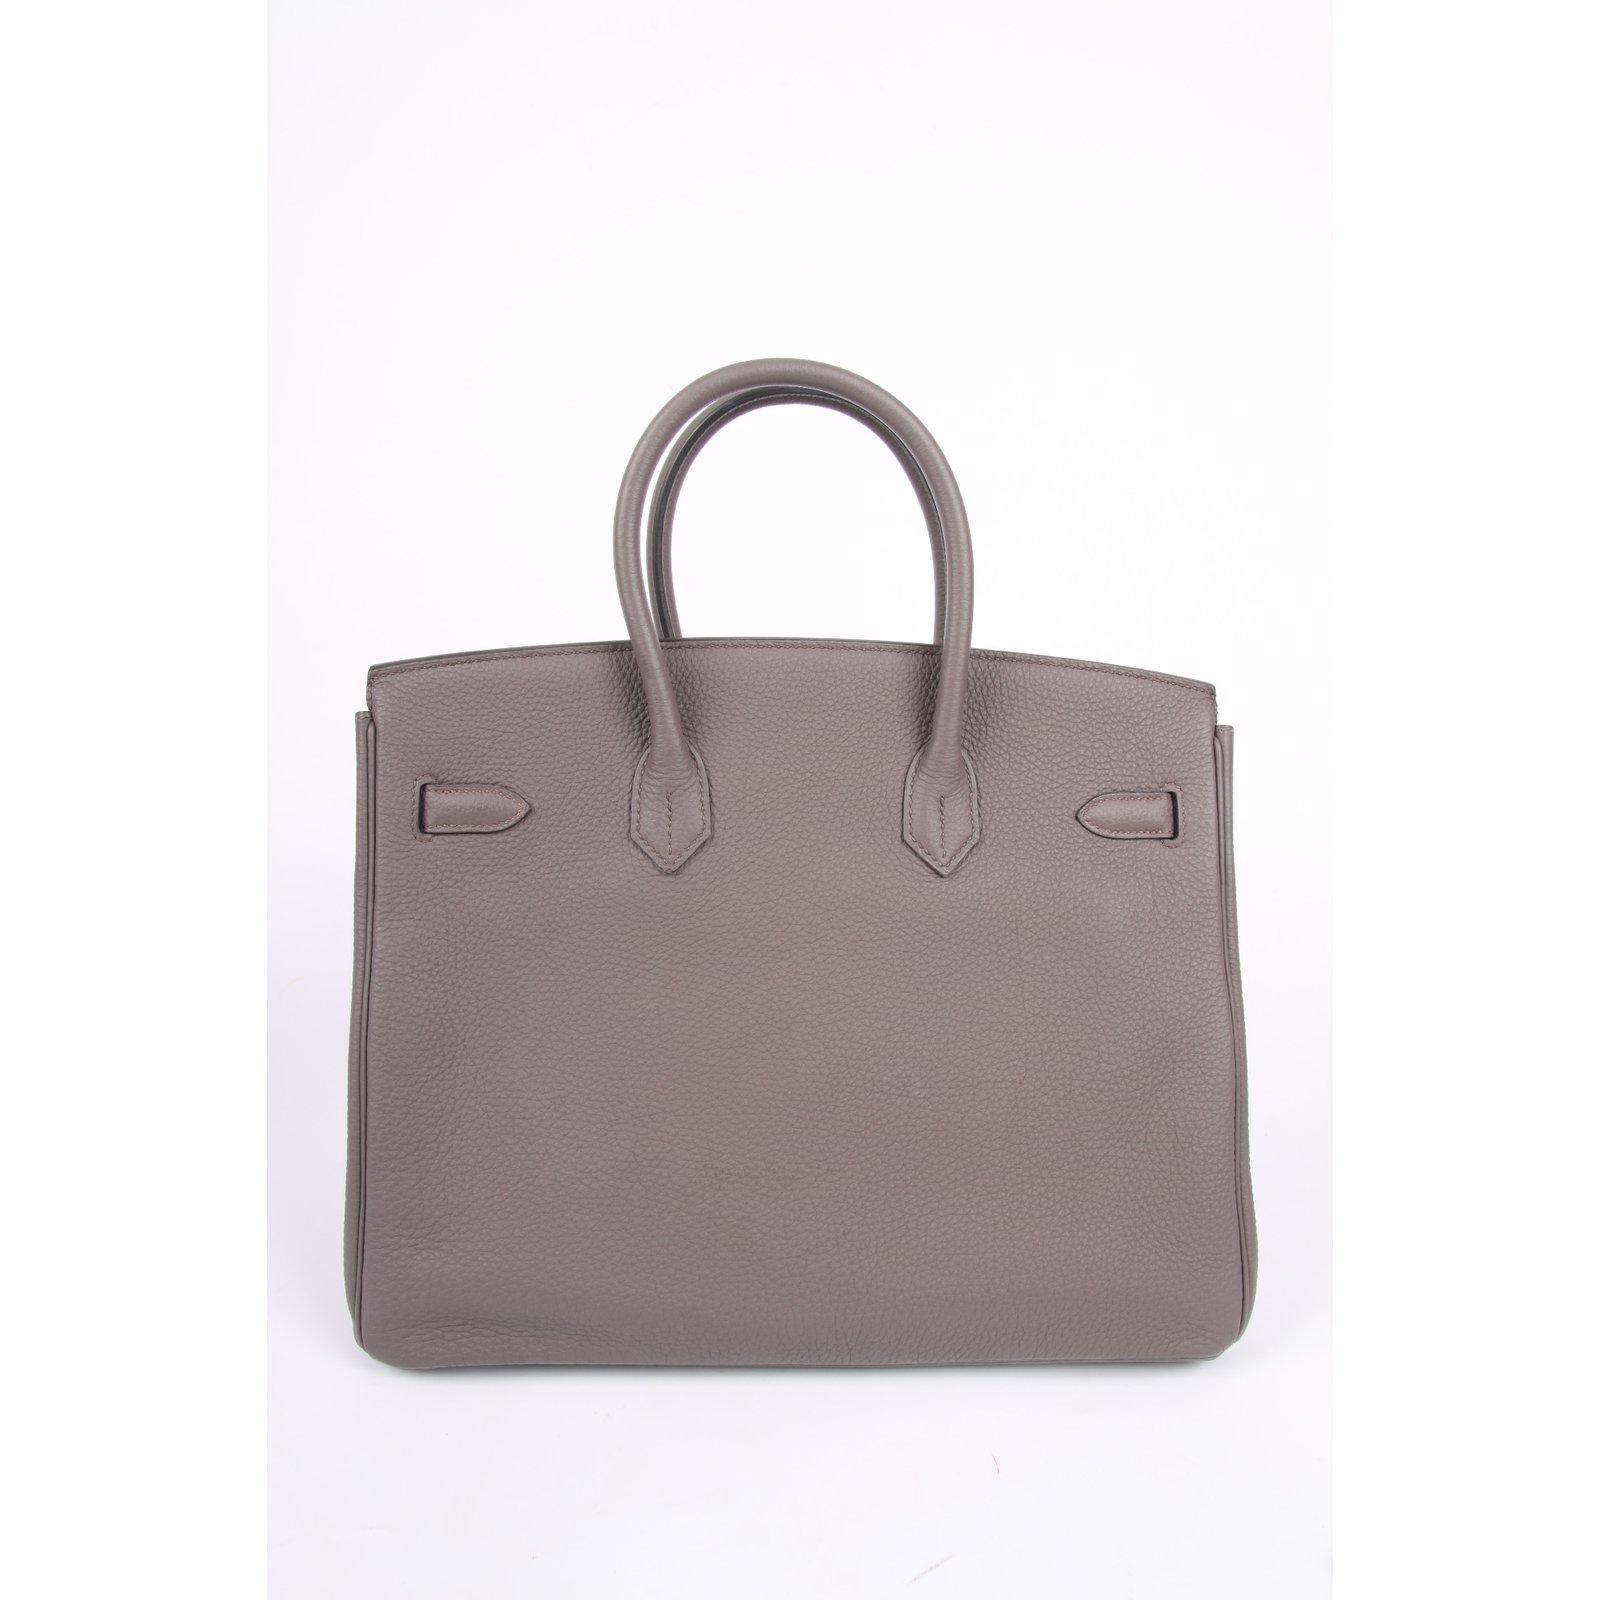 03bc35ad954 Hermès Birkin Togo 35 Etain Palladium Hardware - taupe Handbags ...